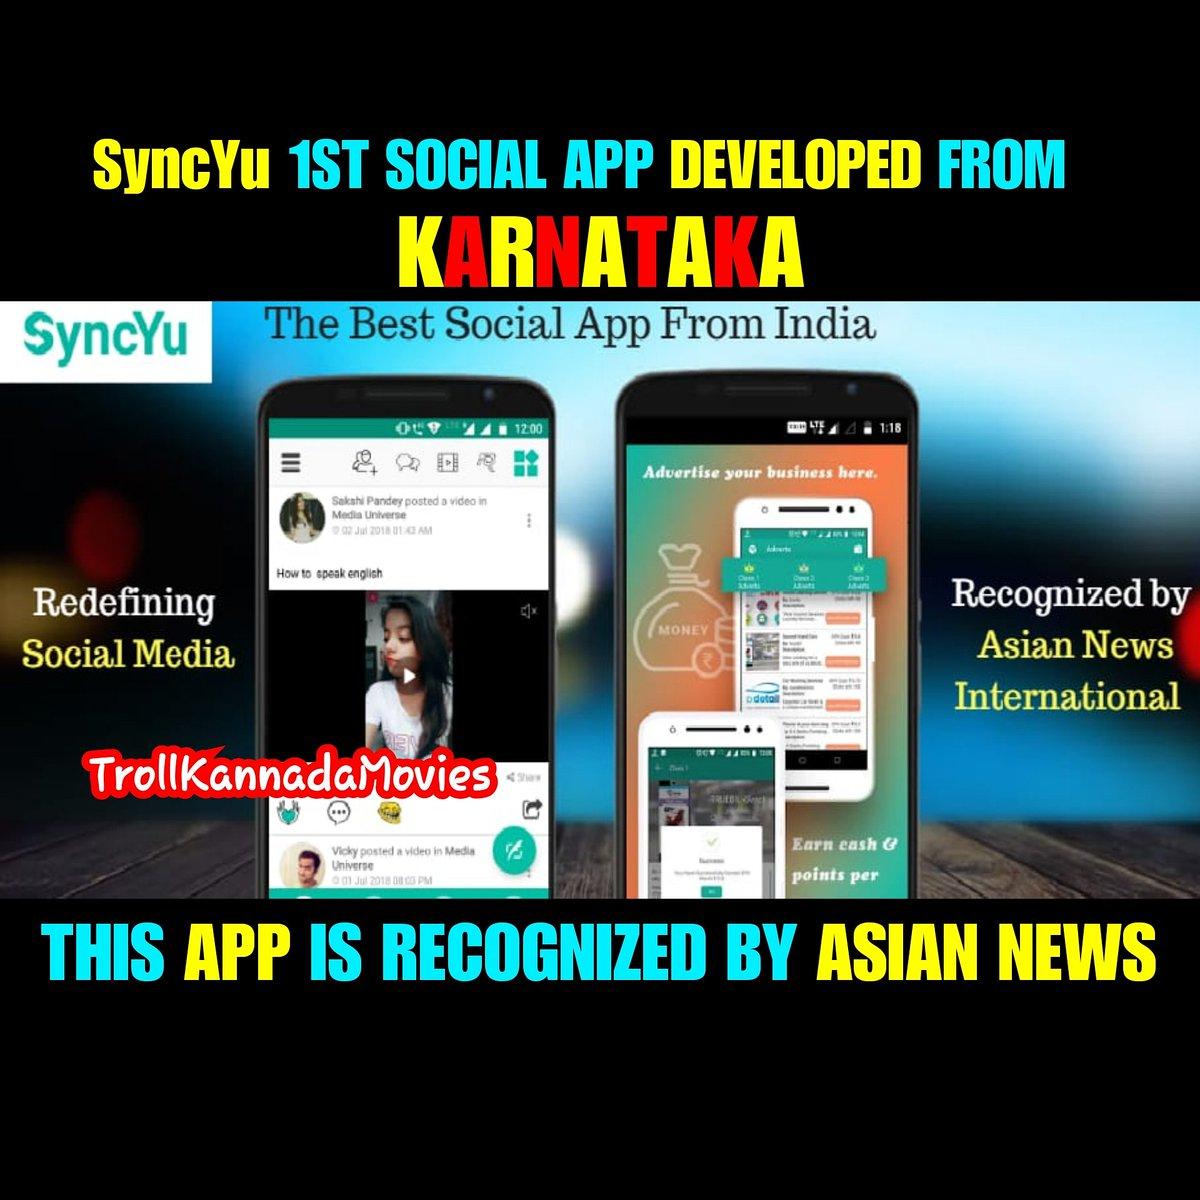 Troll Kannada Movies on Twitter: